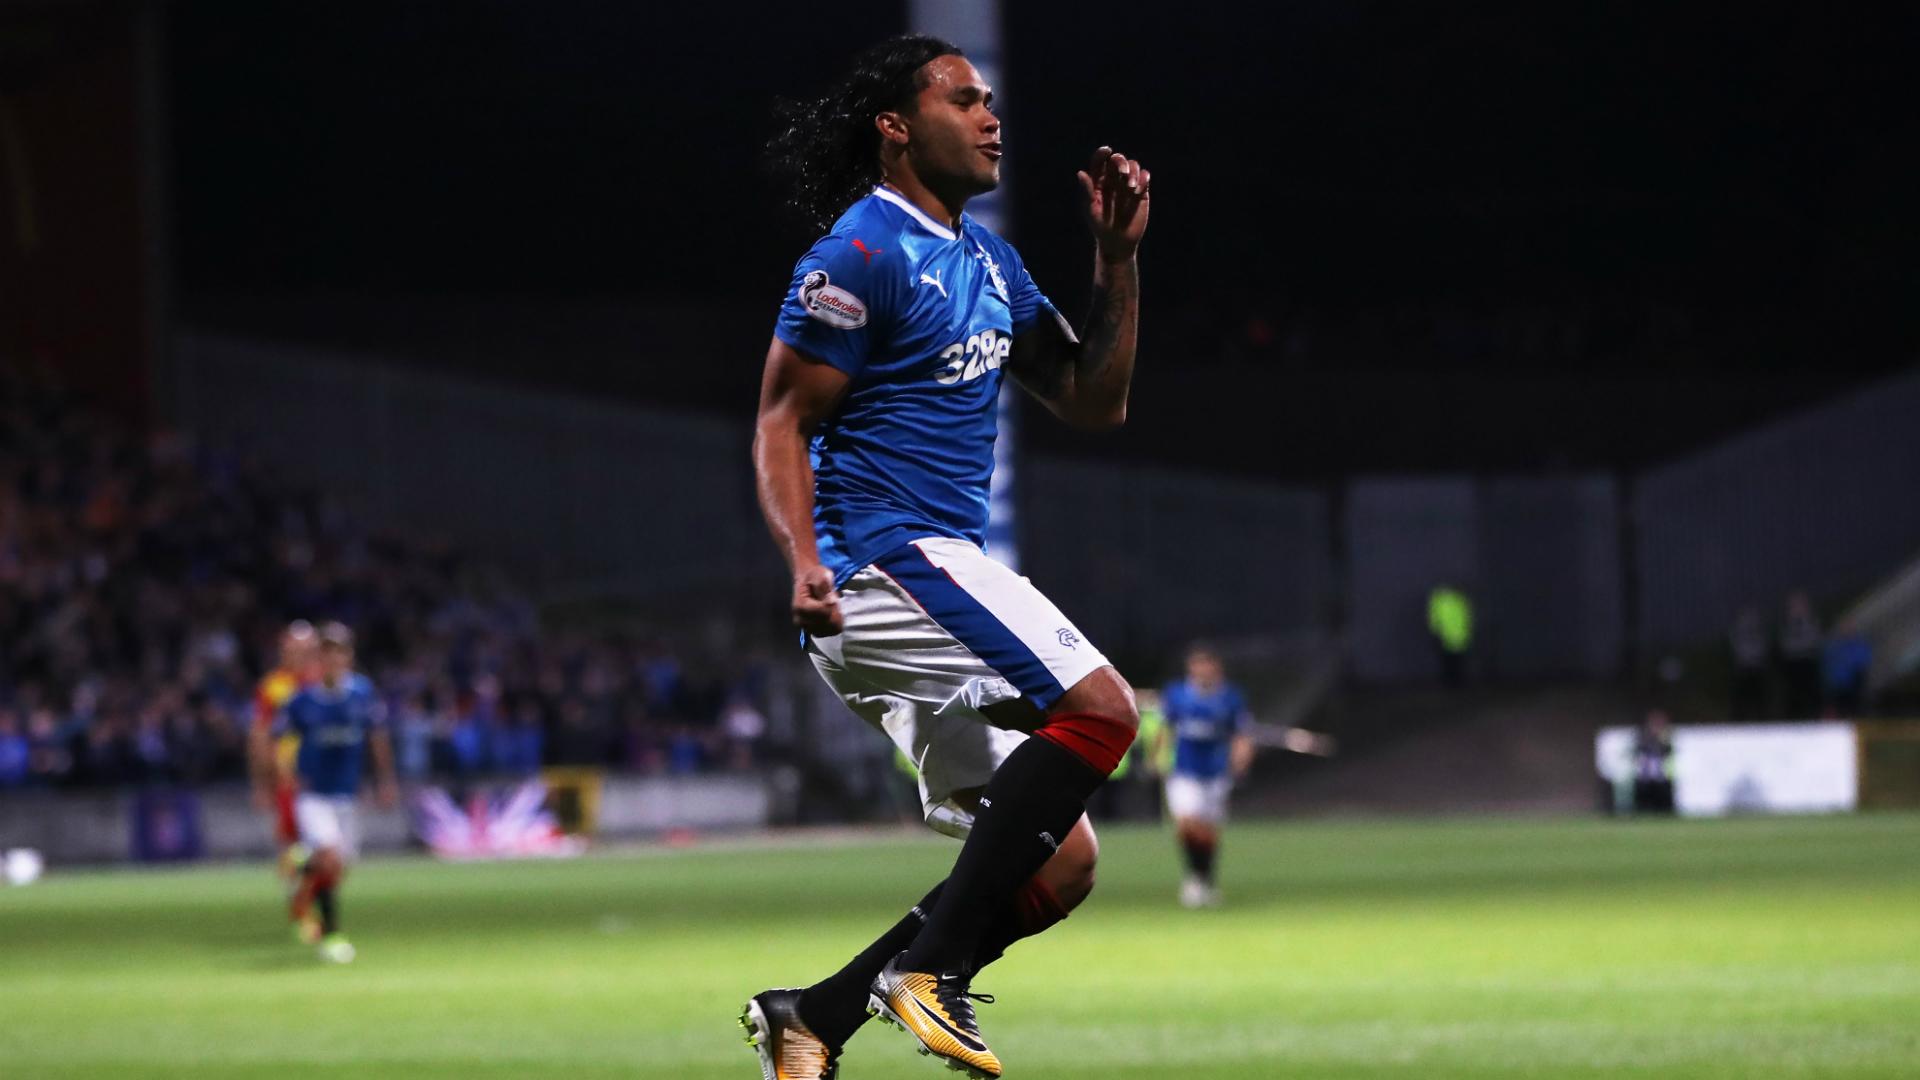 'Gullit' Peña ganará 74 mil pesos diarios con Cruz Azul